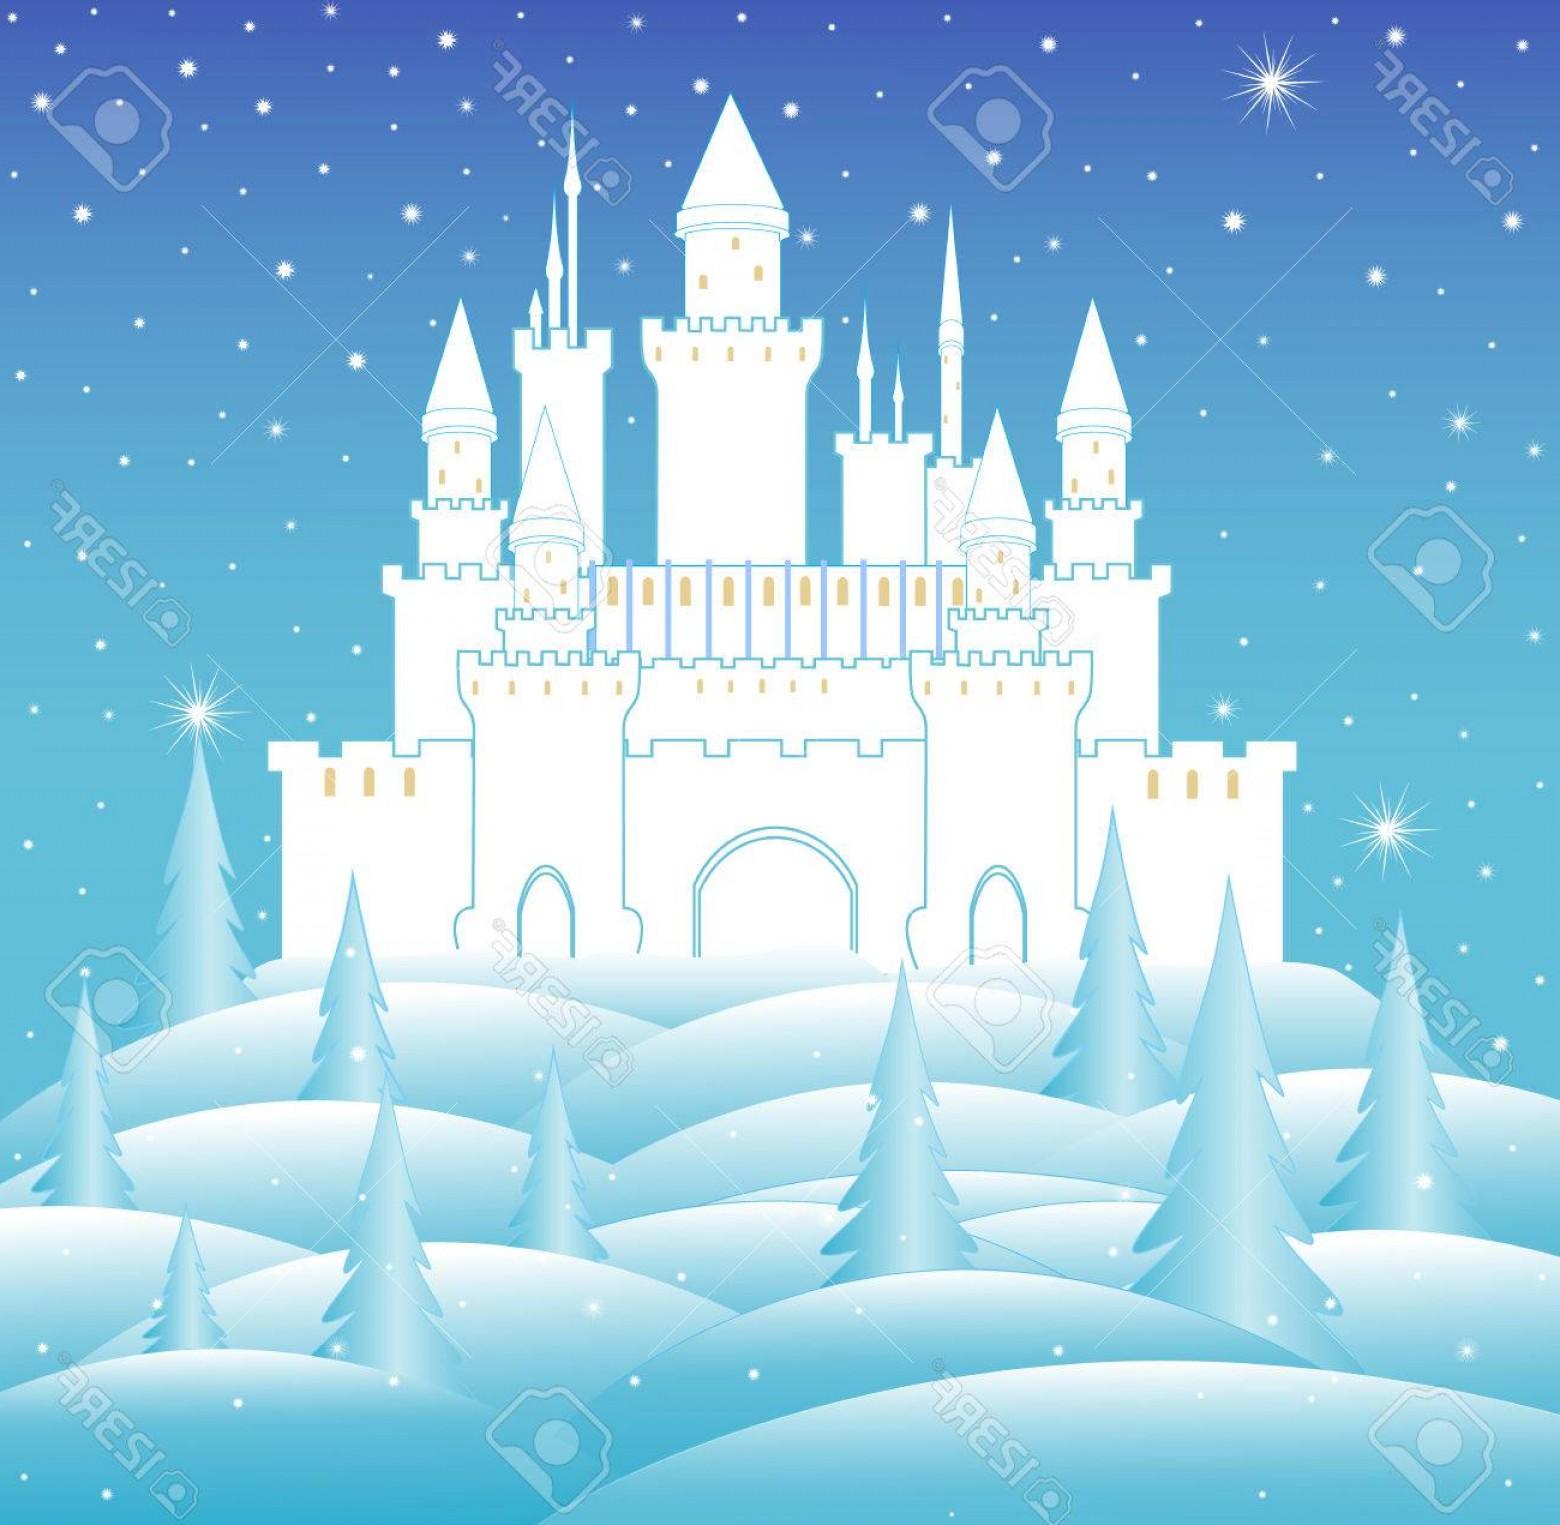 Frozen Castle Vector.